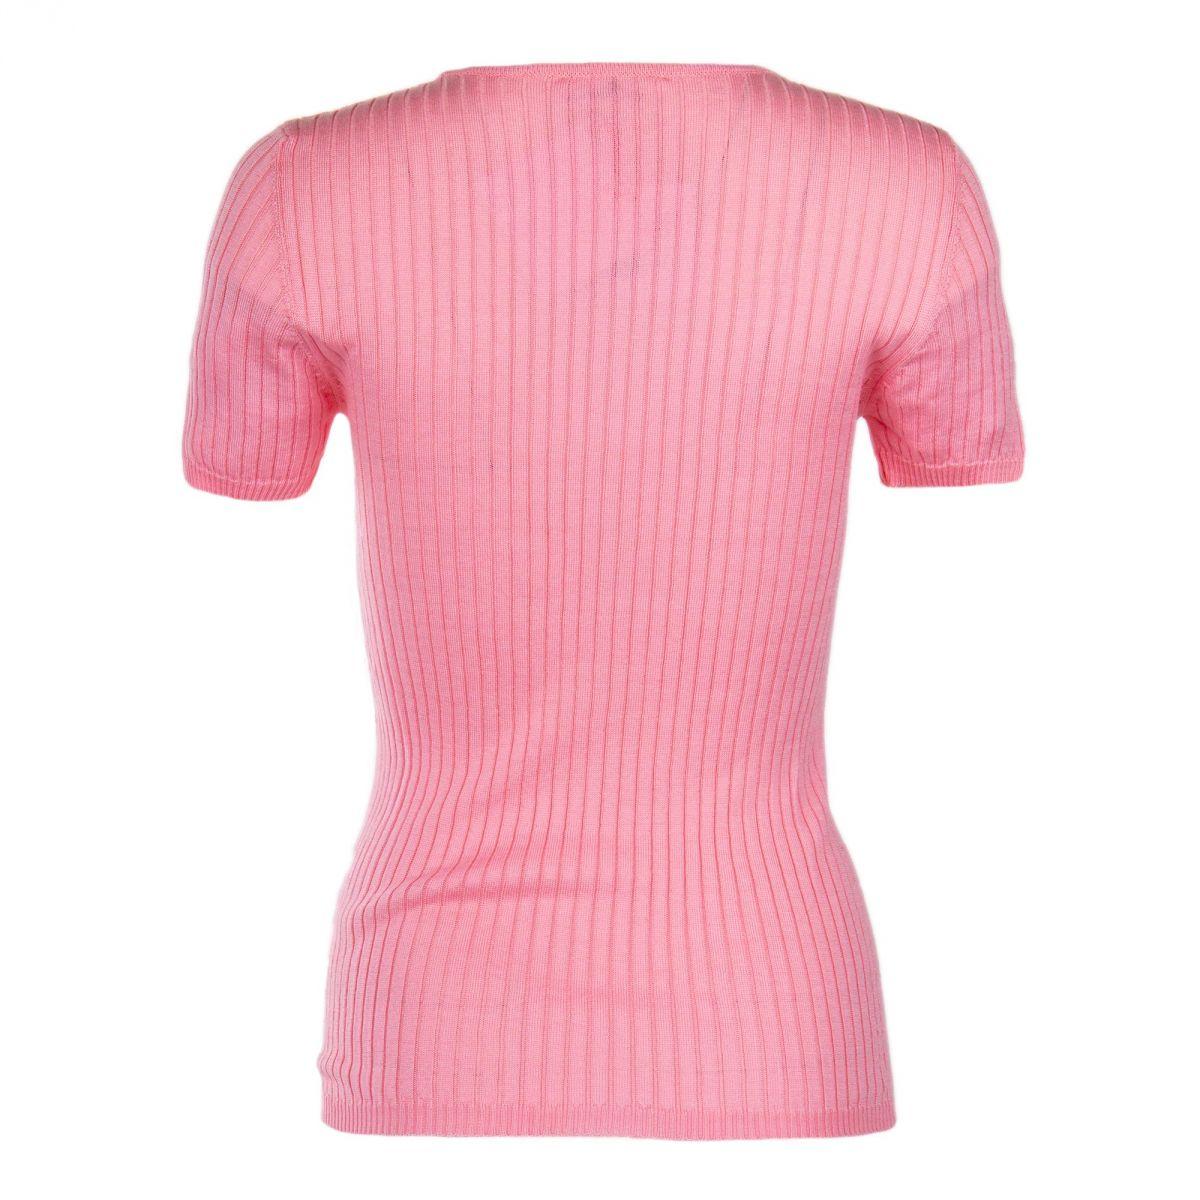 tee shirt manches courtes c tel rose femme courreges prix d griff. Black Bedroom Furniture Sets. Home Design Ideas